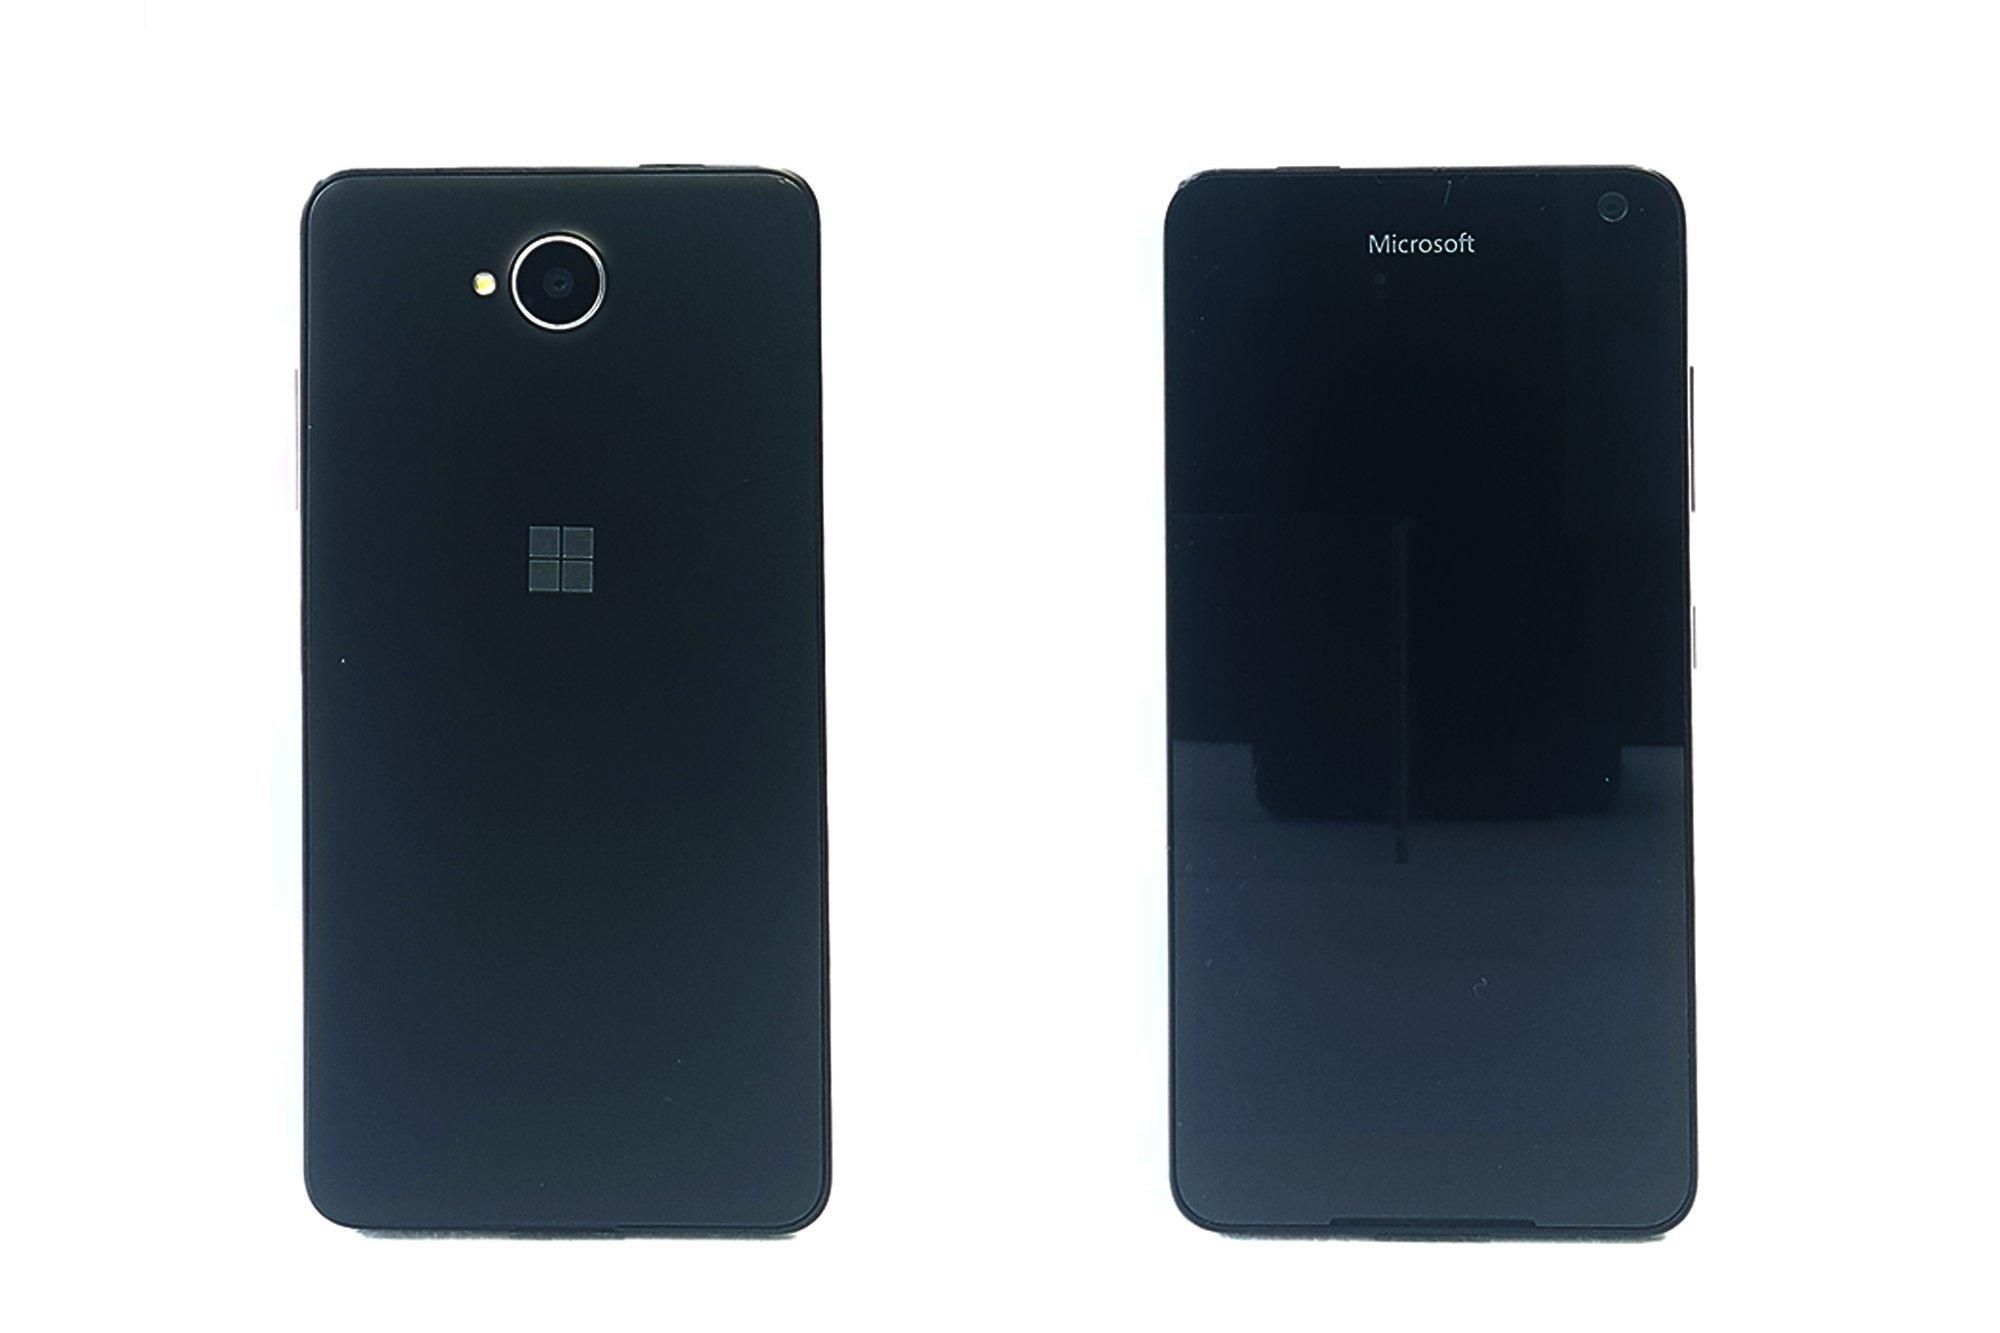 Smartphone Microsoft Lumia 650 Black RM-1152 Damaged